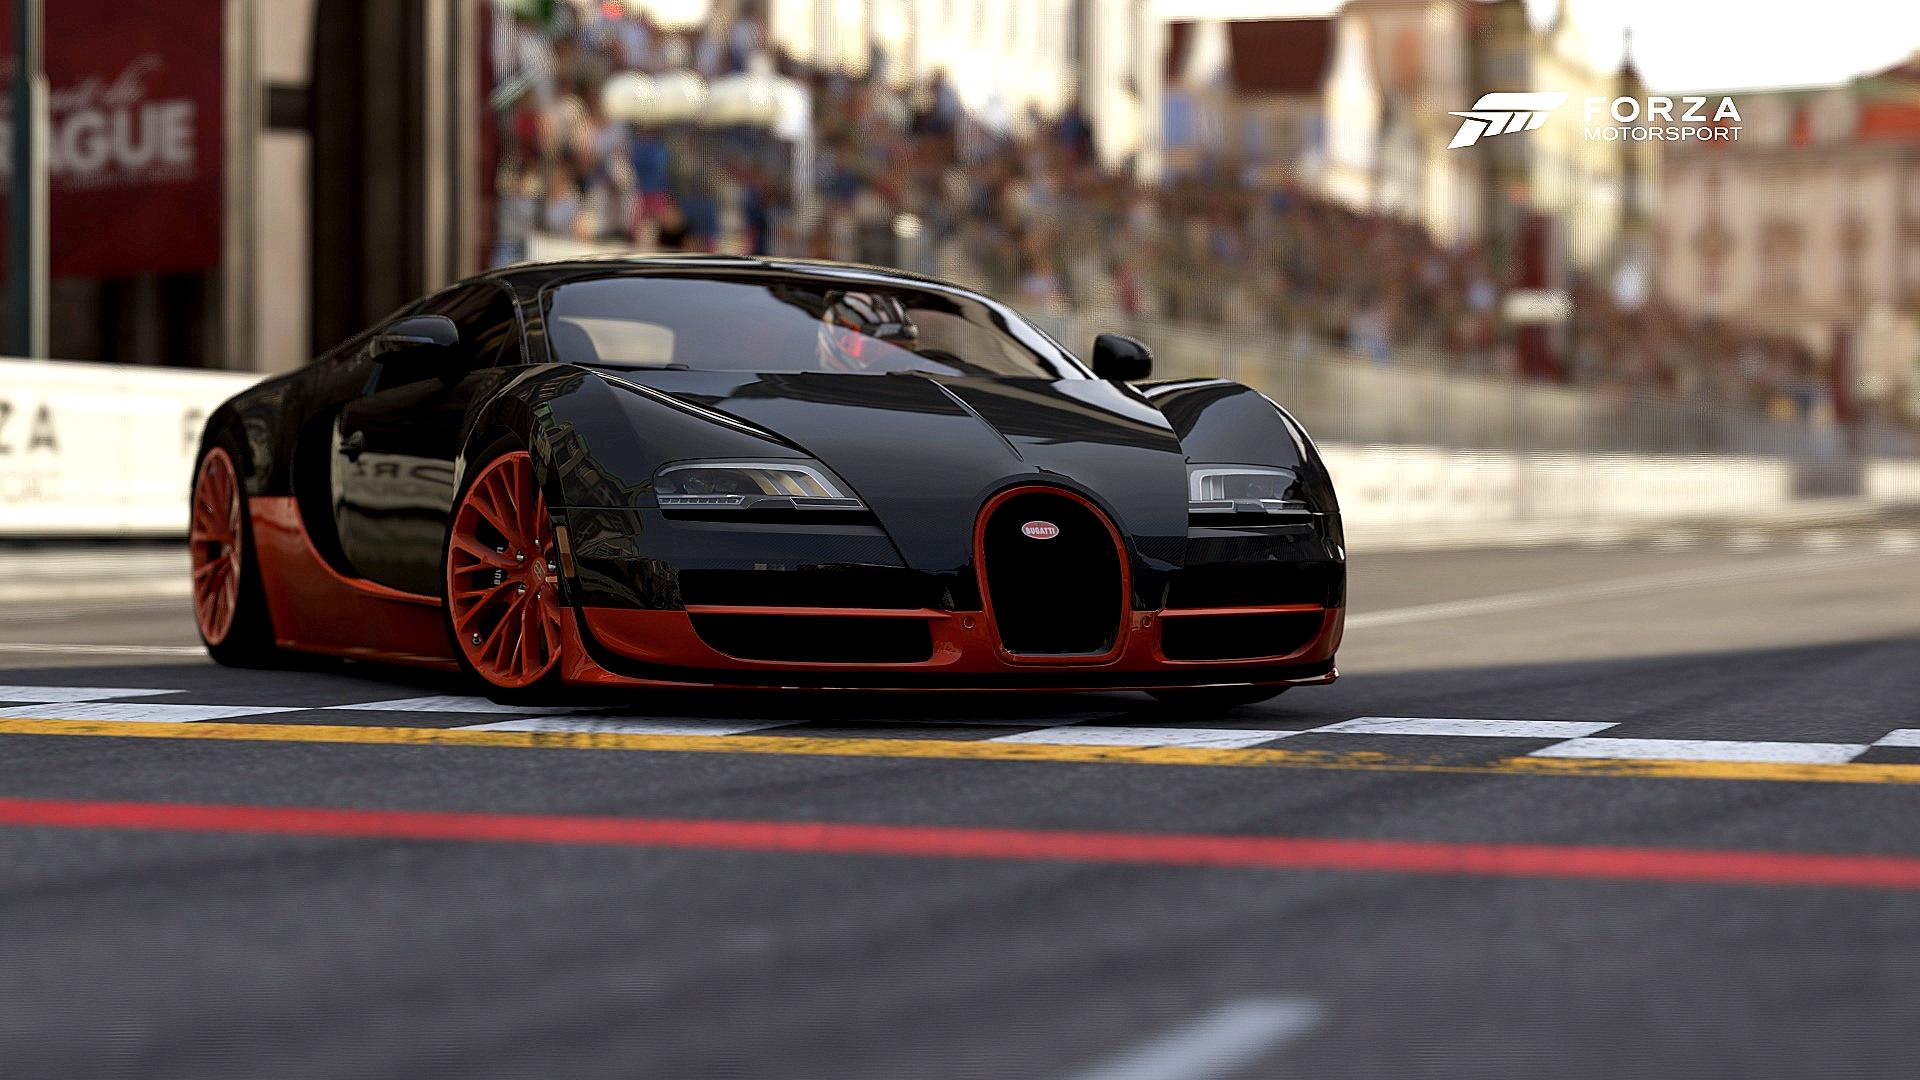 Free Images Wheel Sports Car Supercar Bugatti Veyron Land